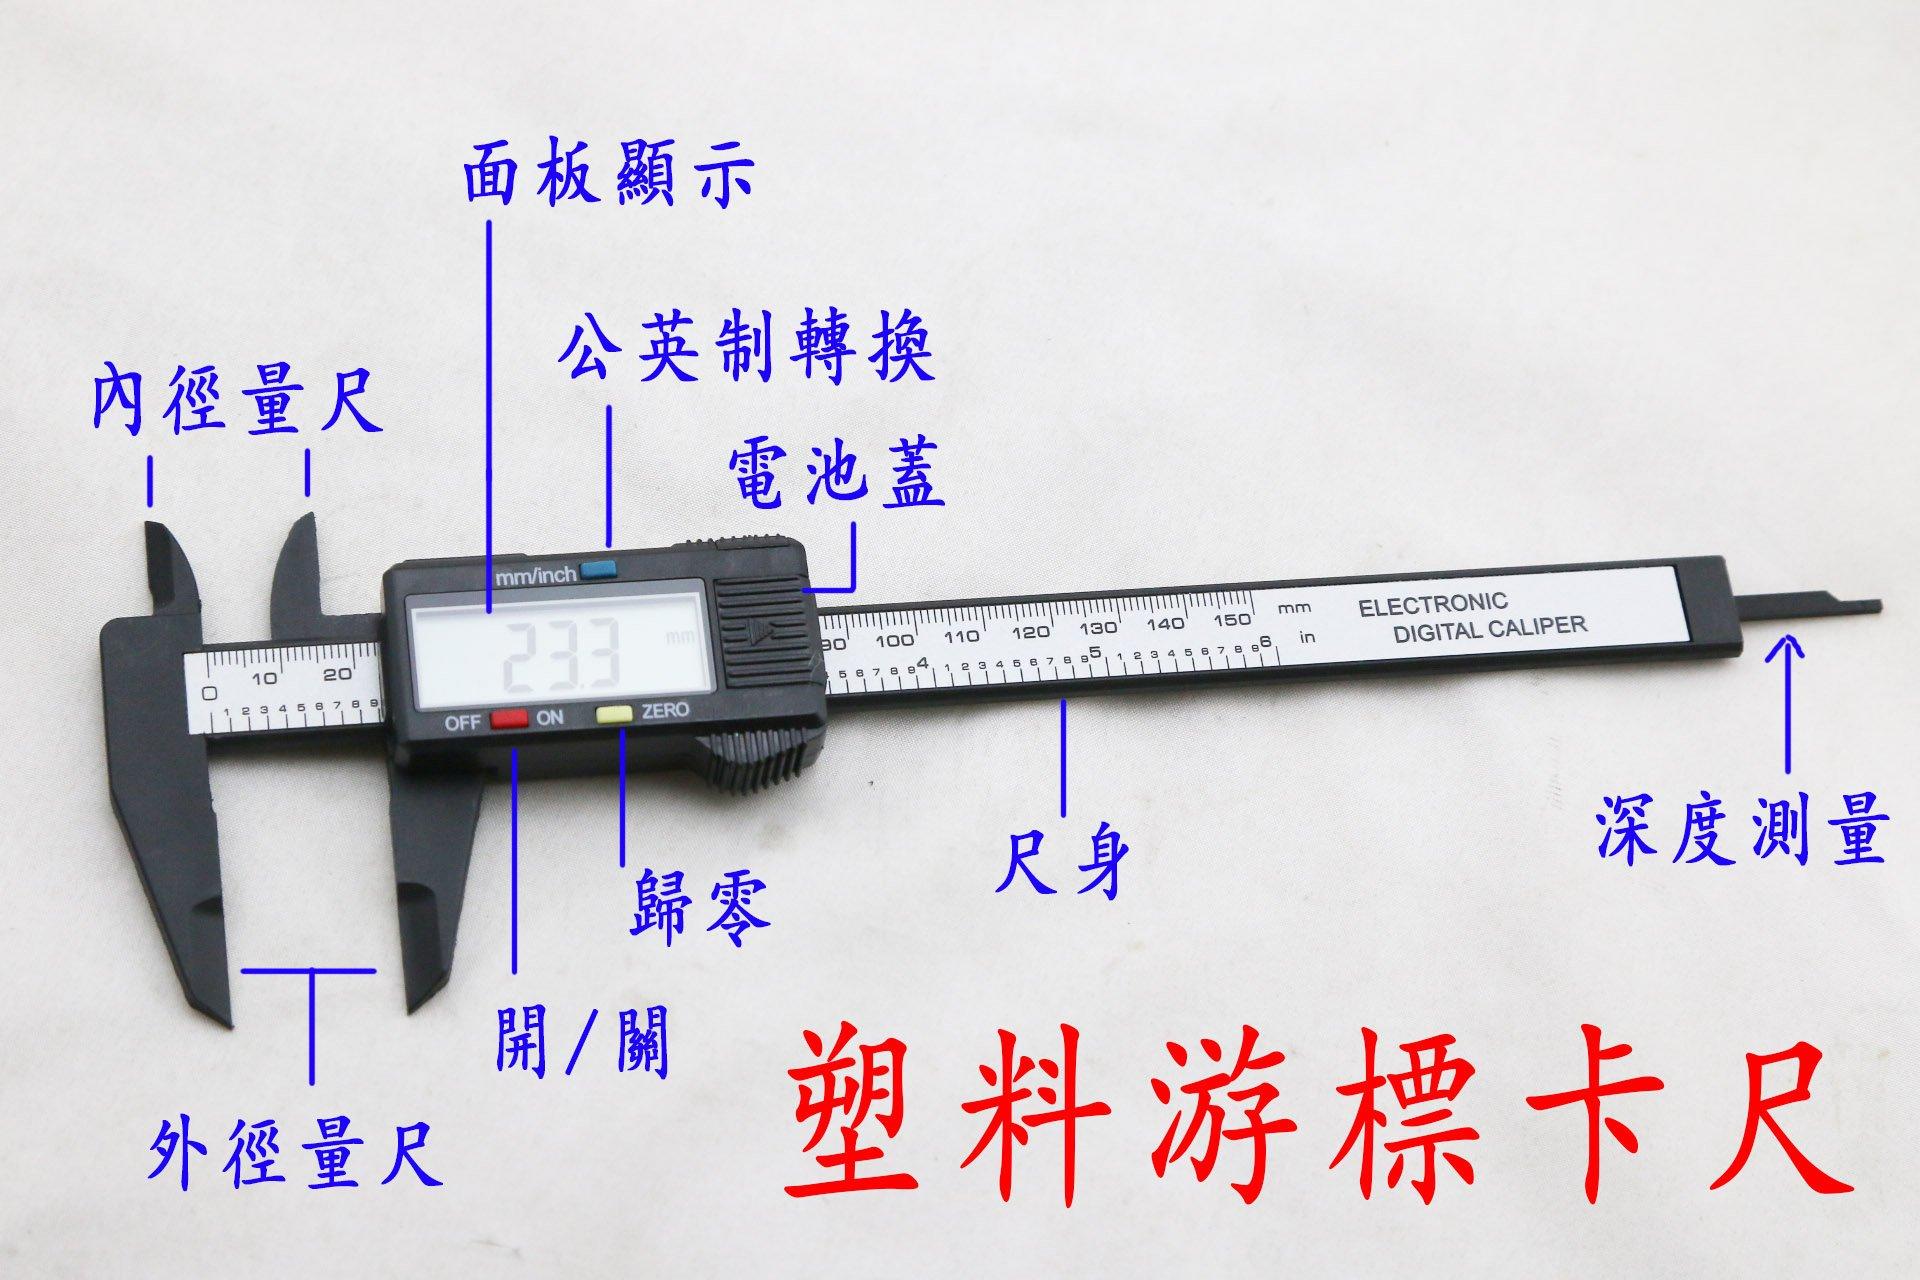 150MM 游標卡尺 全塑料 PA66 量測 翡翠 玉石 玉髓 珠寶  電子 螢幕顯示 緬甸玉 裸裝